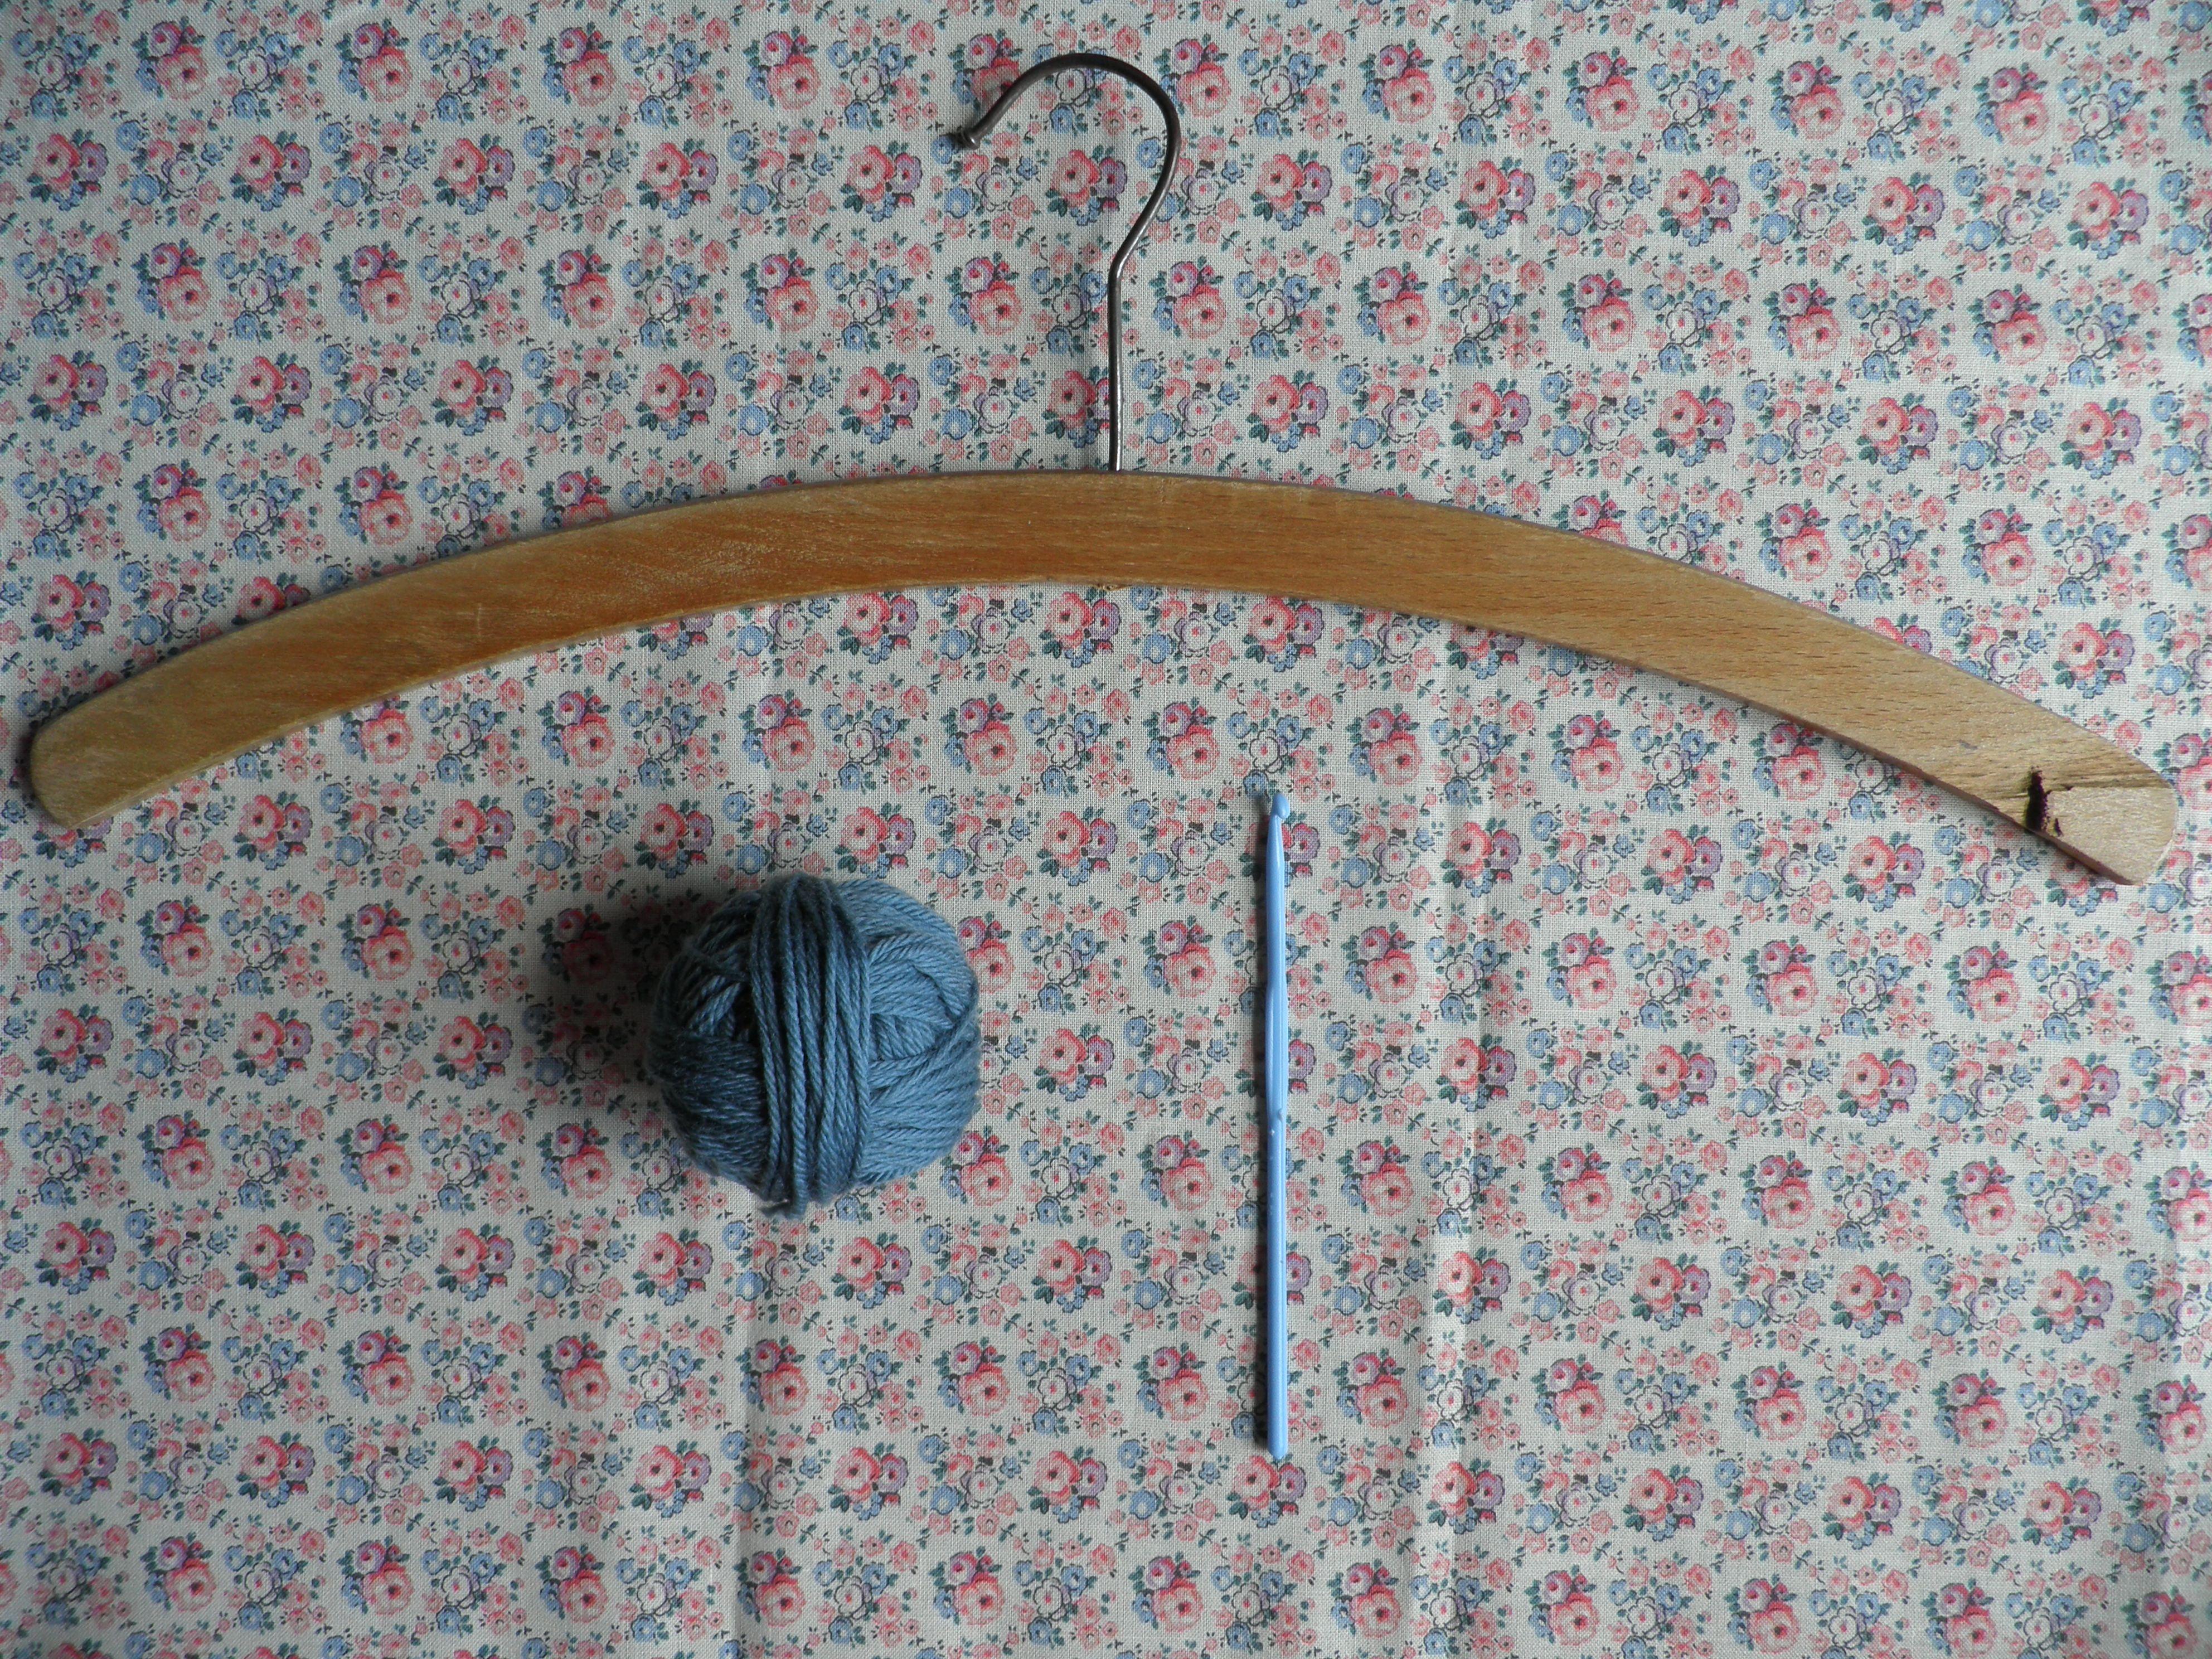 How to make a crochet coat hanger cover - Mollie Makes | Crochet ...